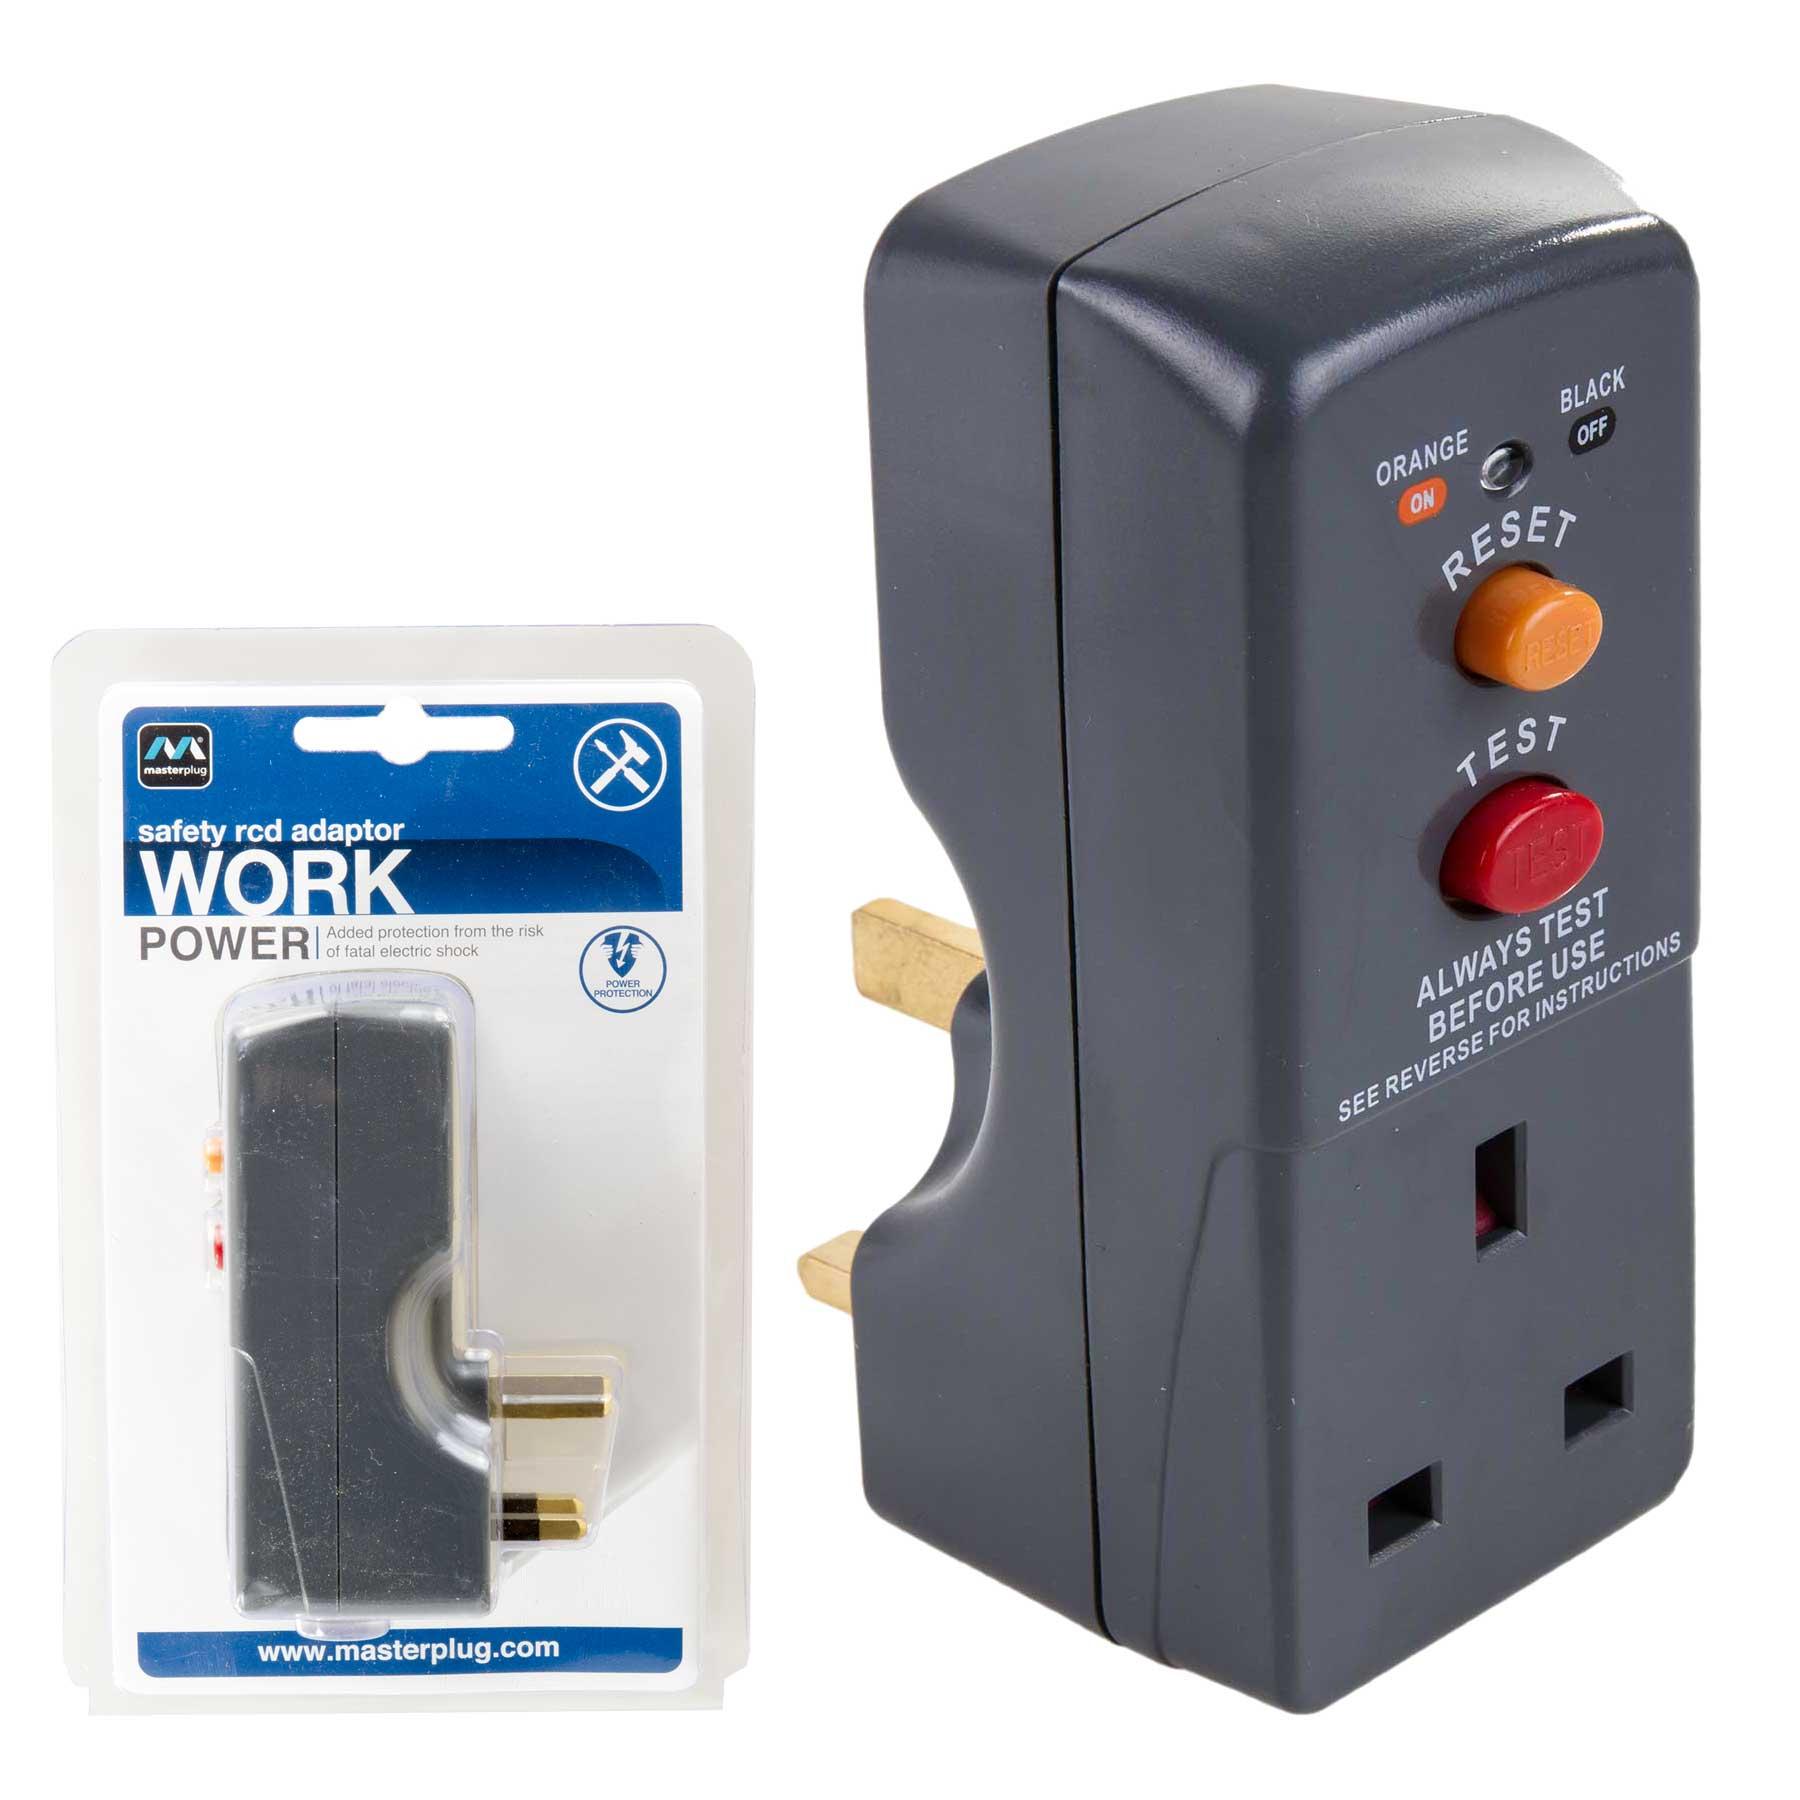 Fuse Box Rcd Keeps Tripping : Masterplug safety rcd adaptor circuit breaker